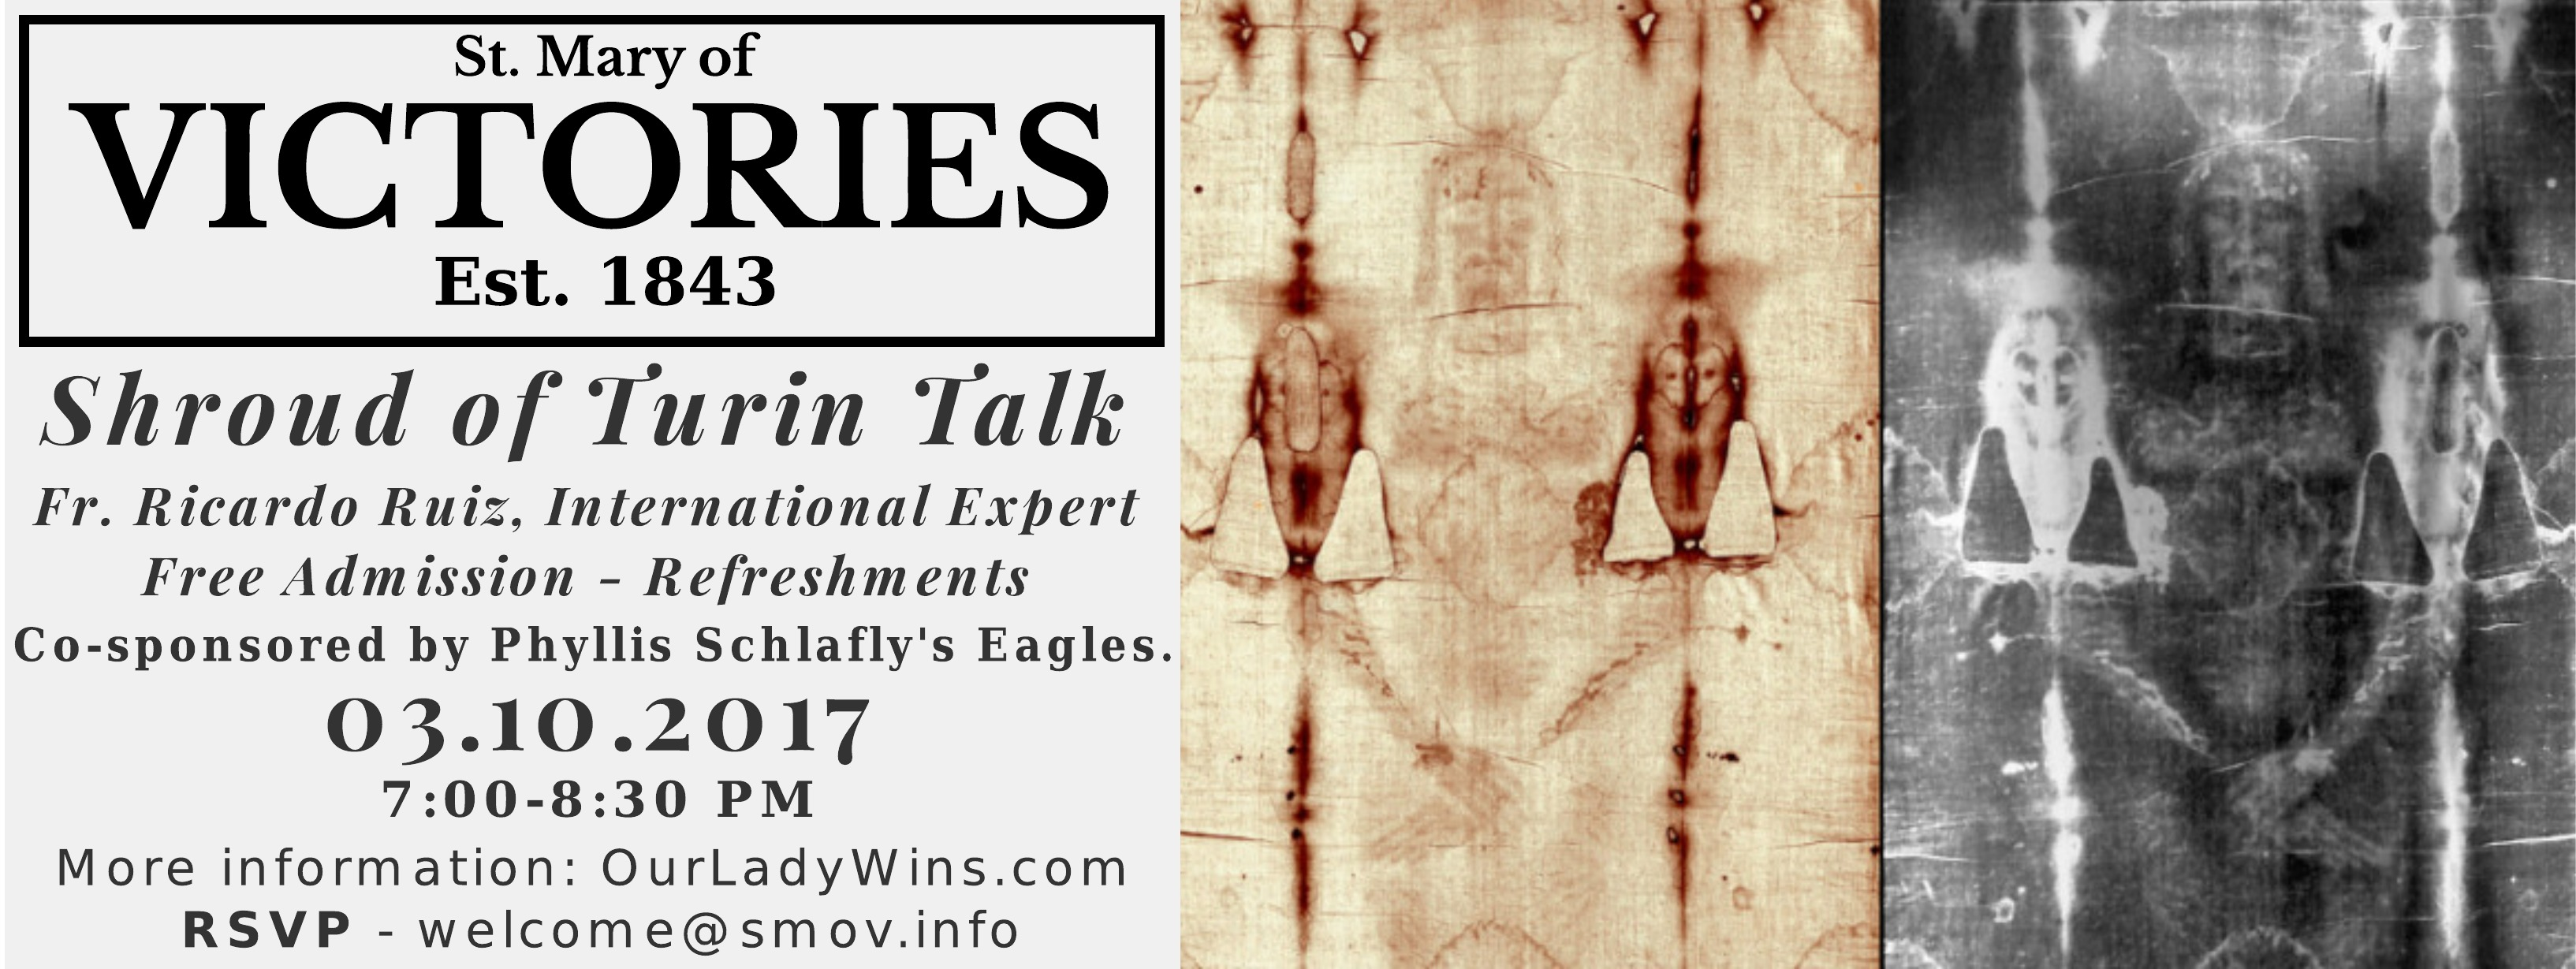 Shroud of Turin Talk